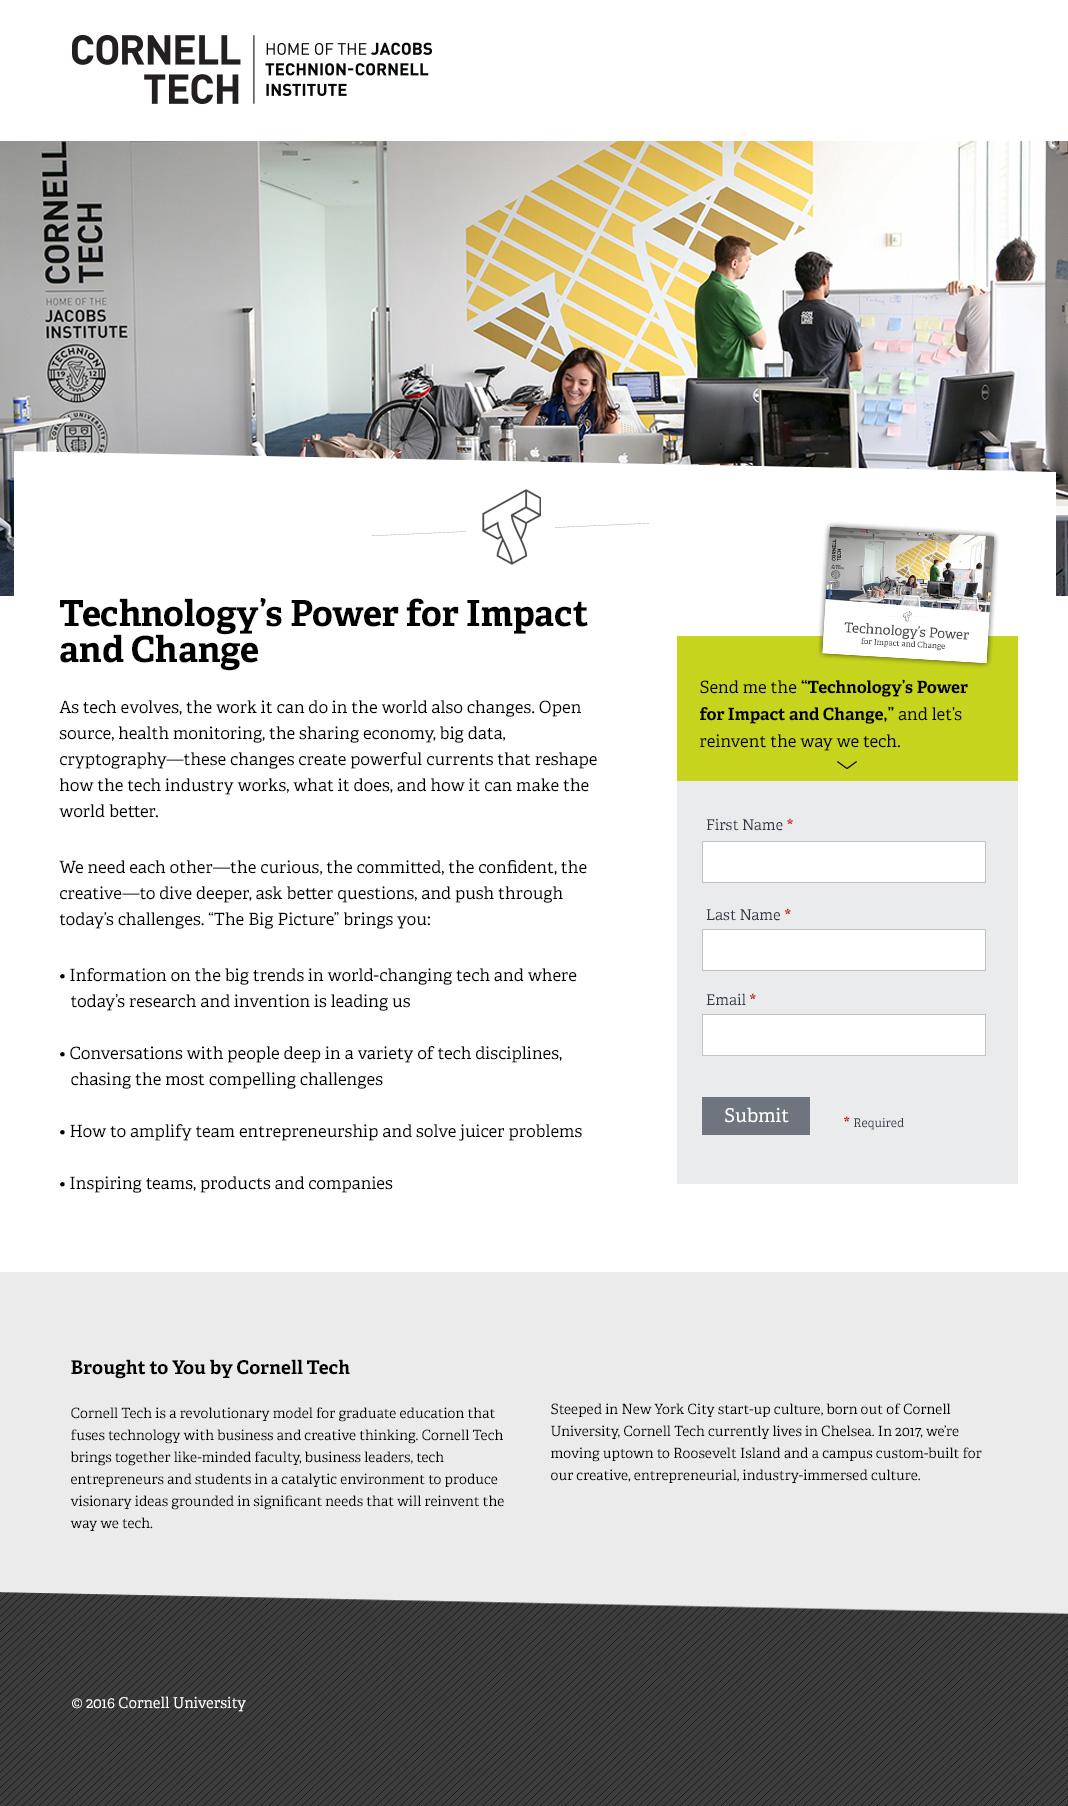 CornellTech-LandingPage-TechnologysPower